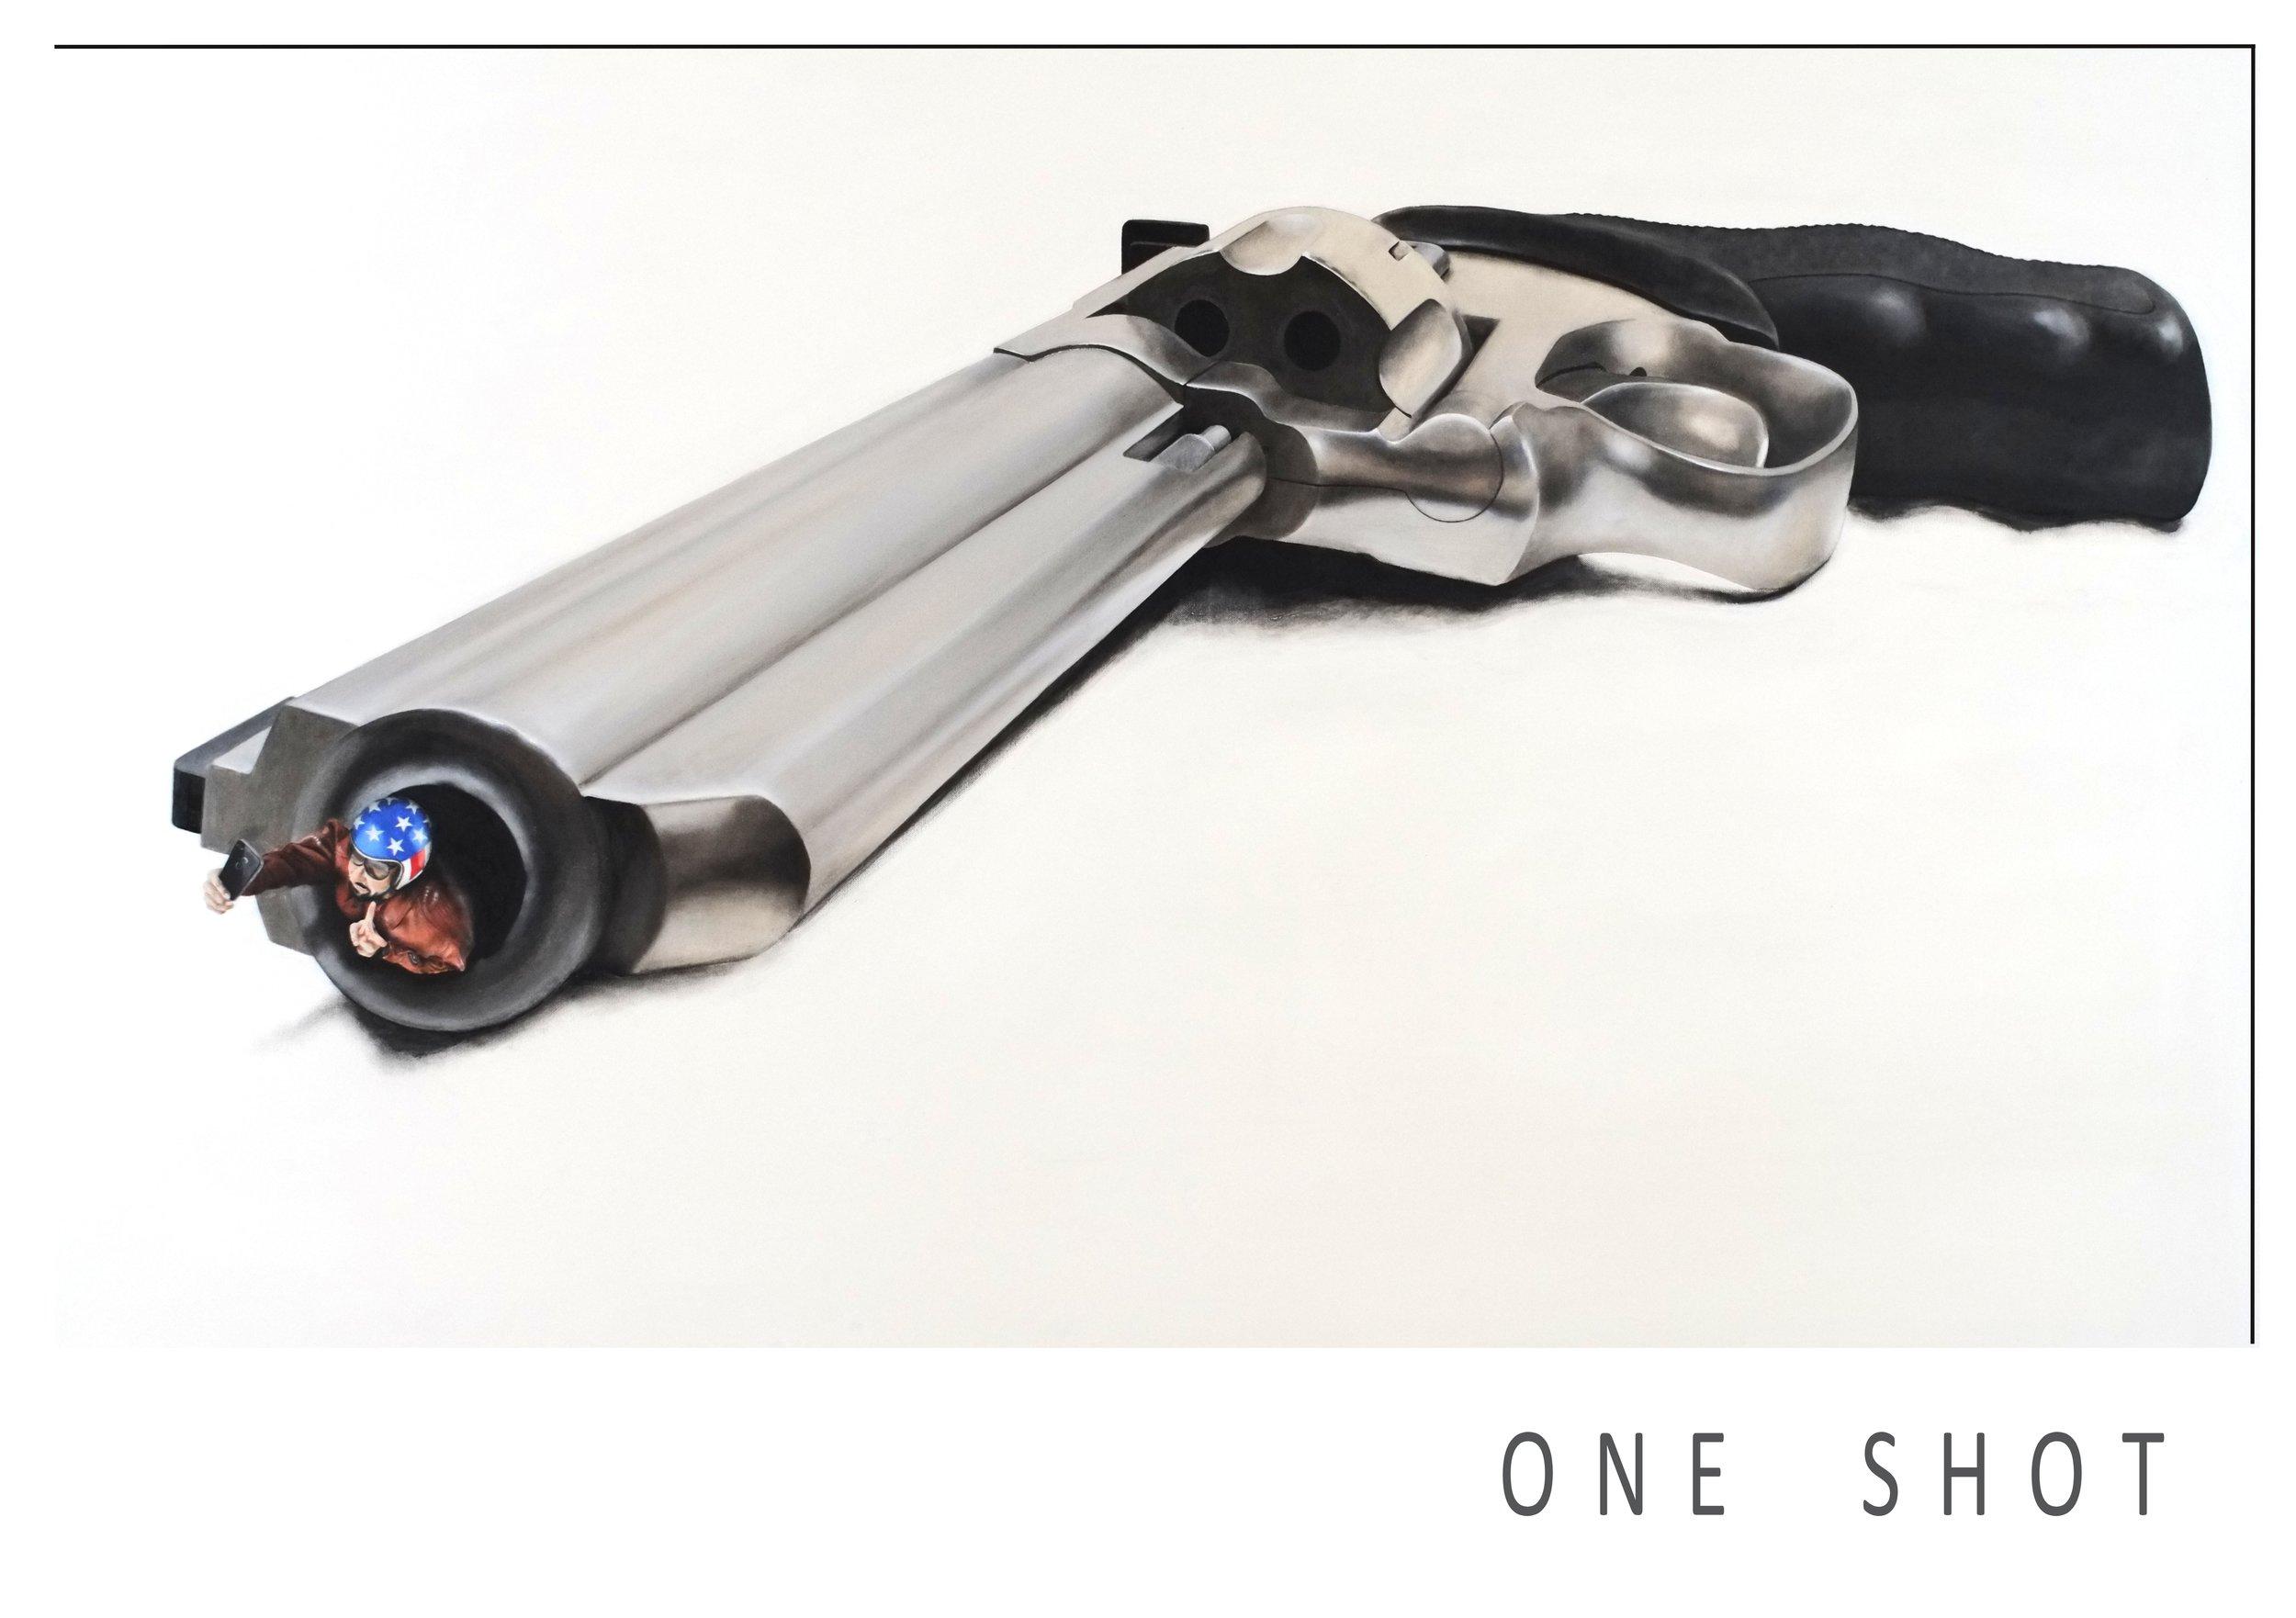 ONE SHOT -Pagina001.jpeg